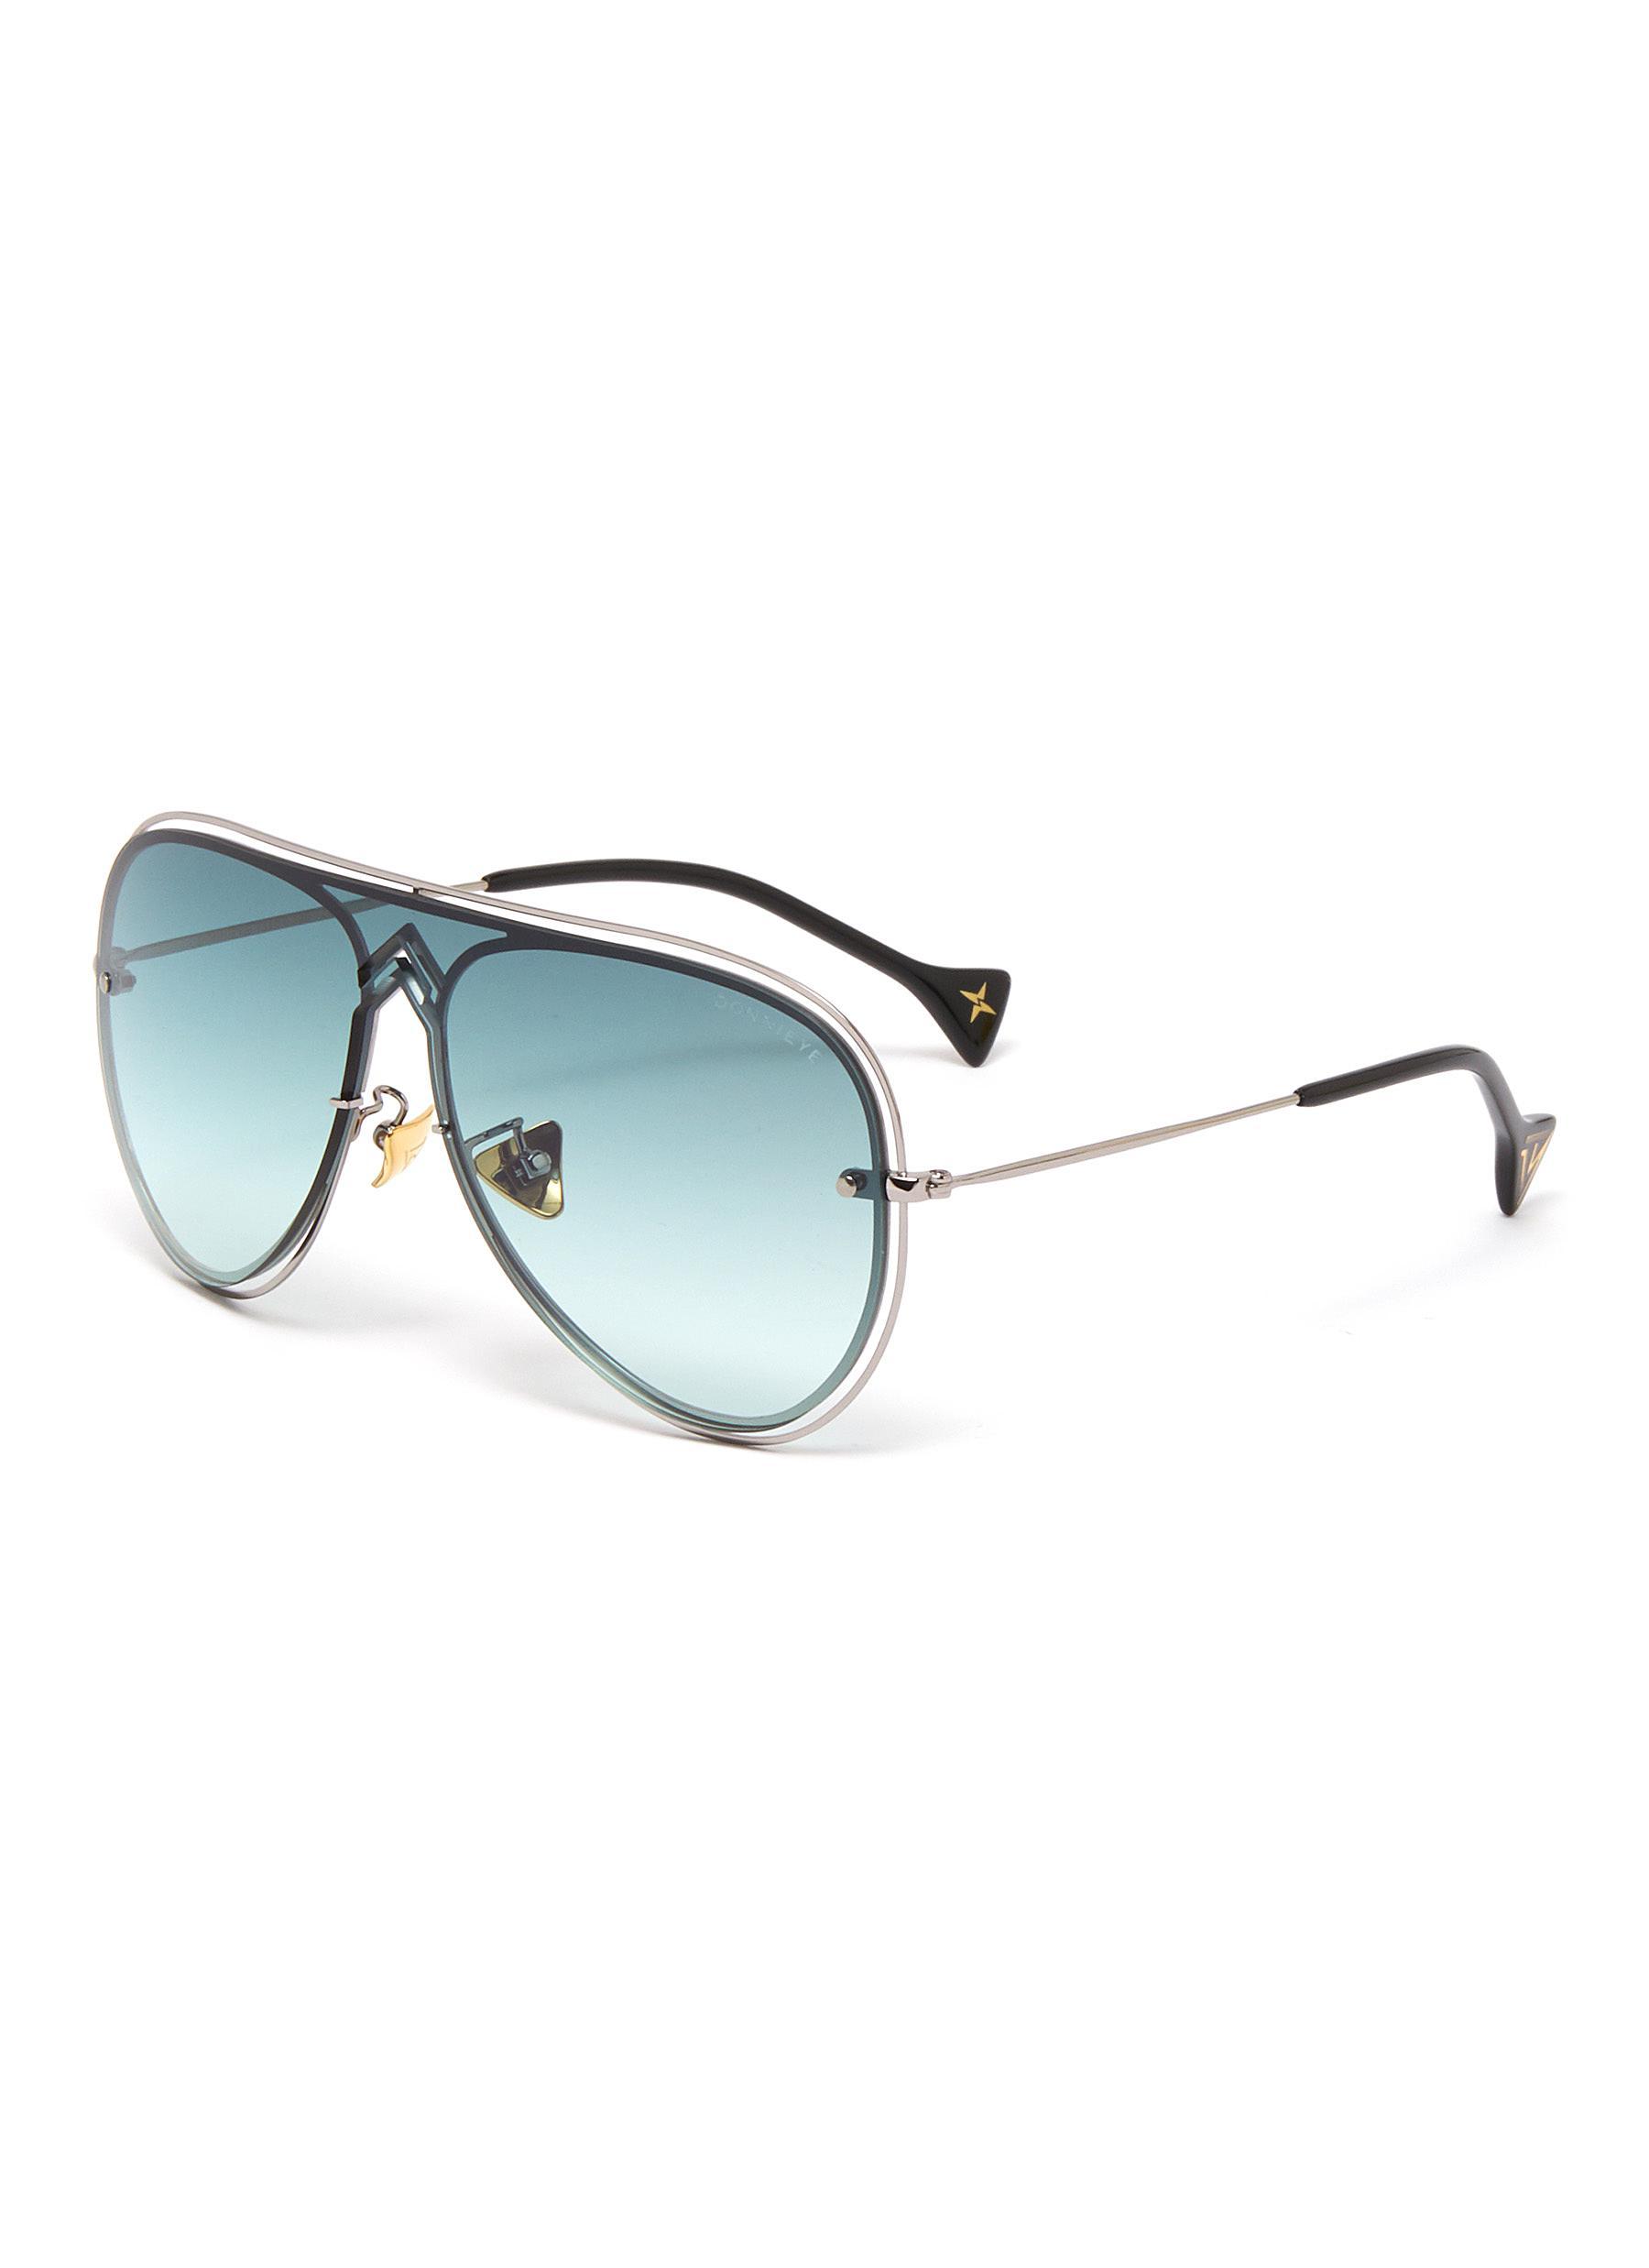 'Peace' metal frame cutout aviator sunglasses